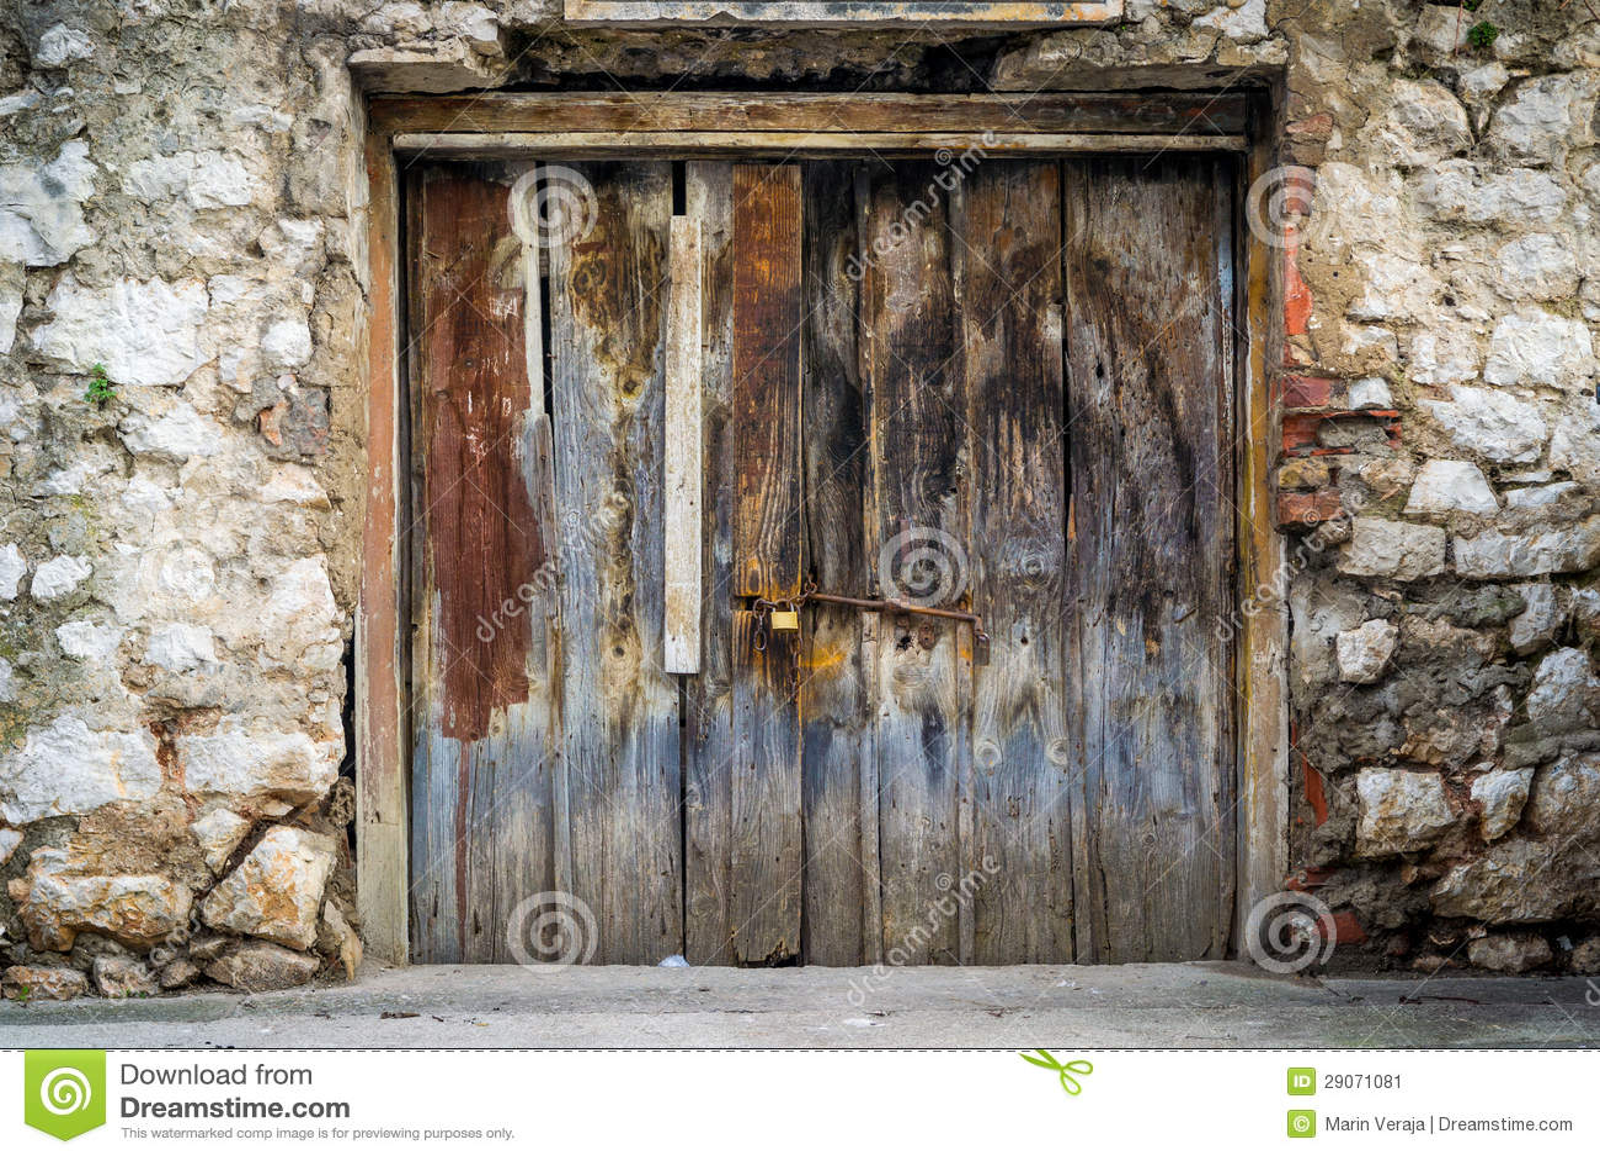 Puertas de madera r sticas viejas imagen de archivo - Puertas viejas de madera ...